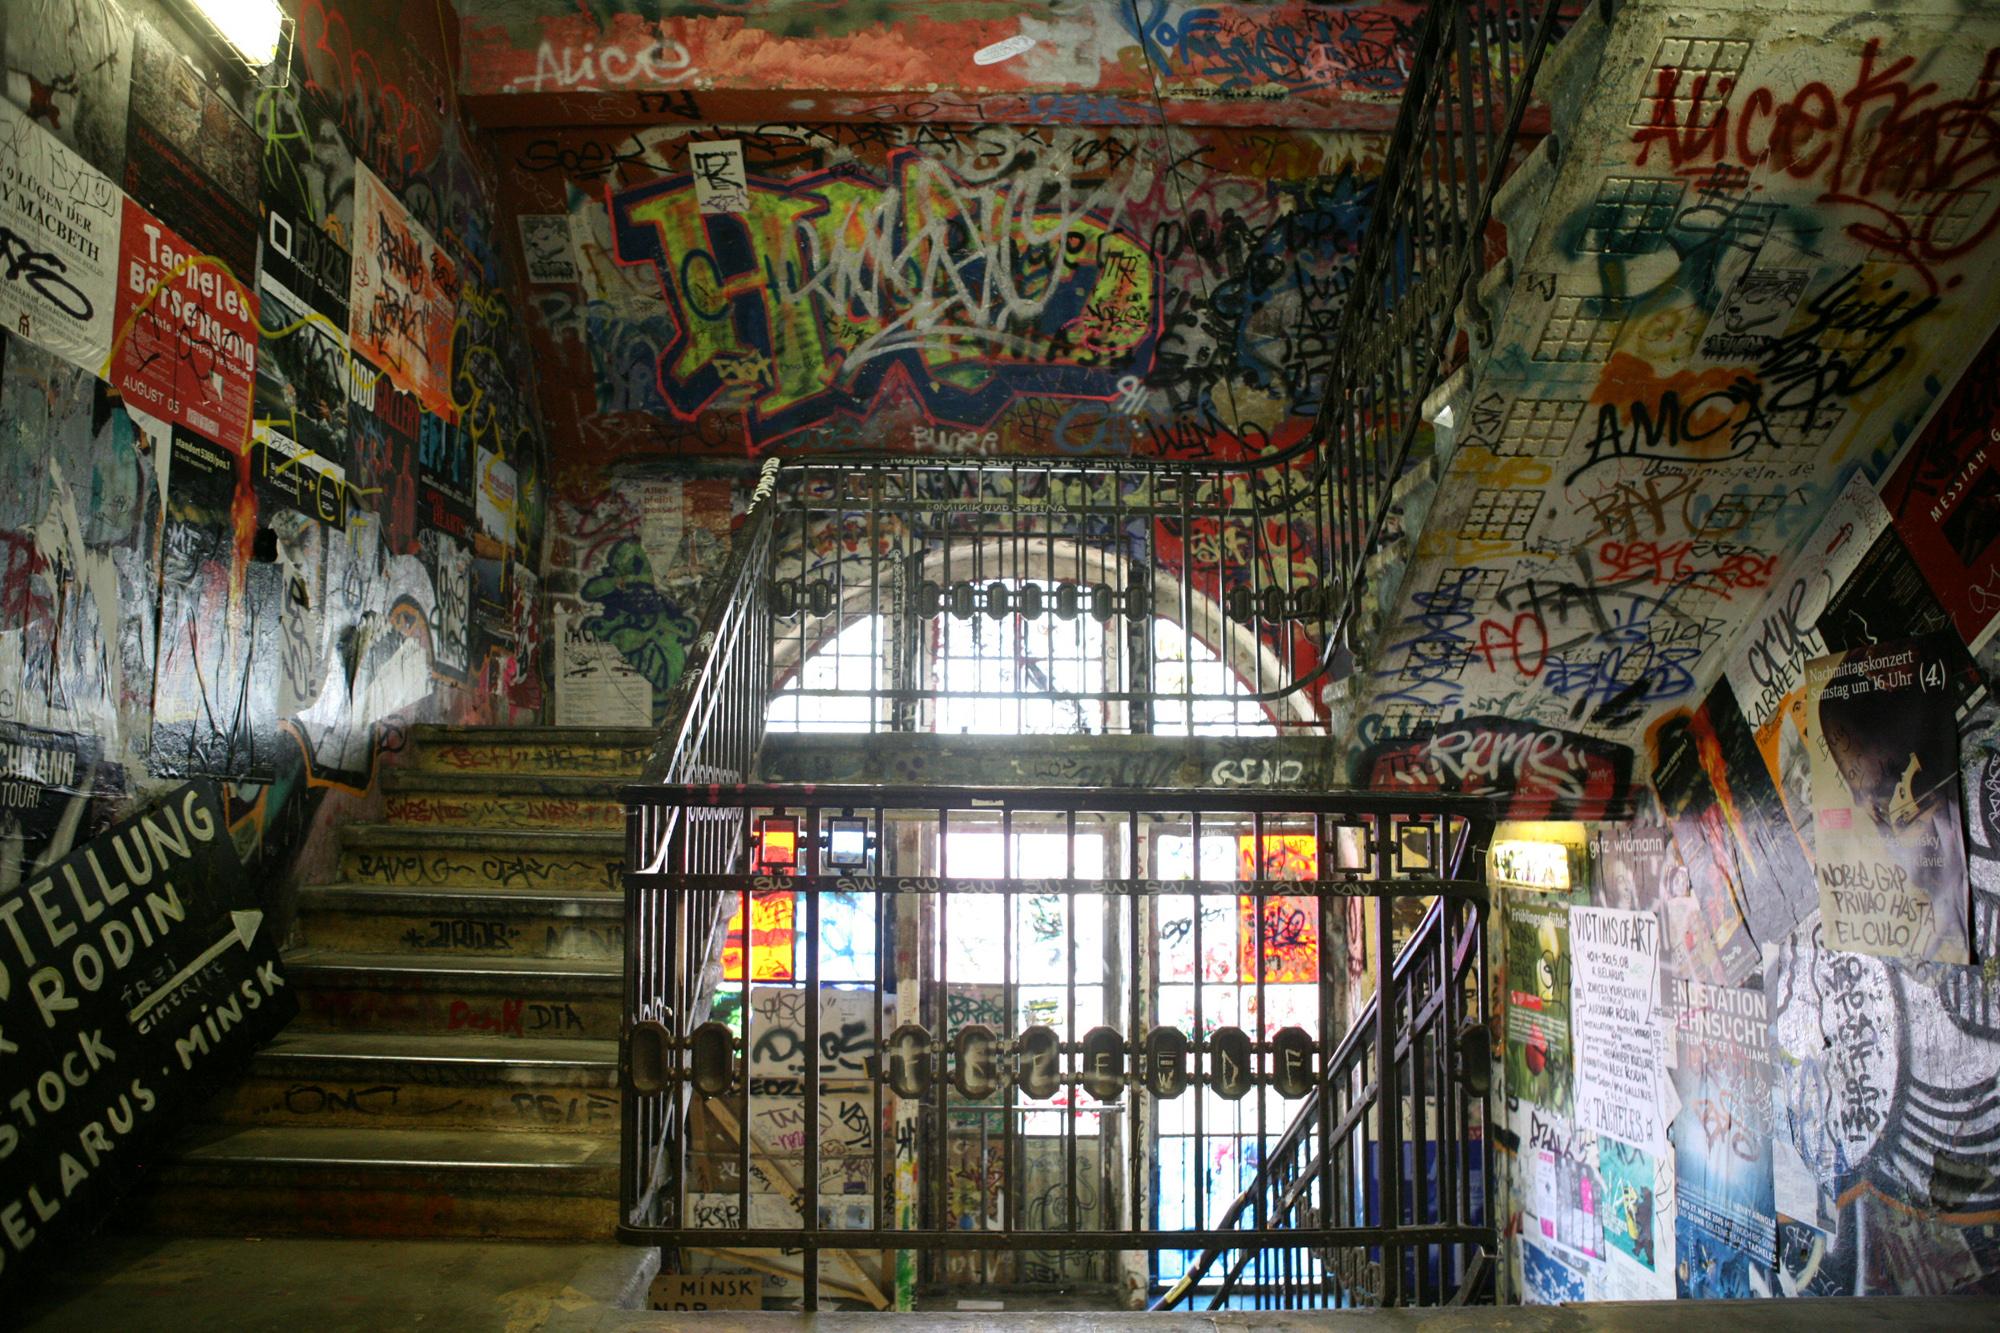 http://upload.wikimedia.org/wikipedia/commons/e/e6/Kunsthaus_Tacheles_stairway_with_Graffiti.JPG